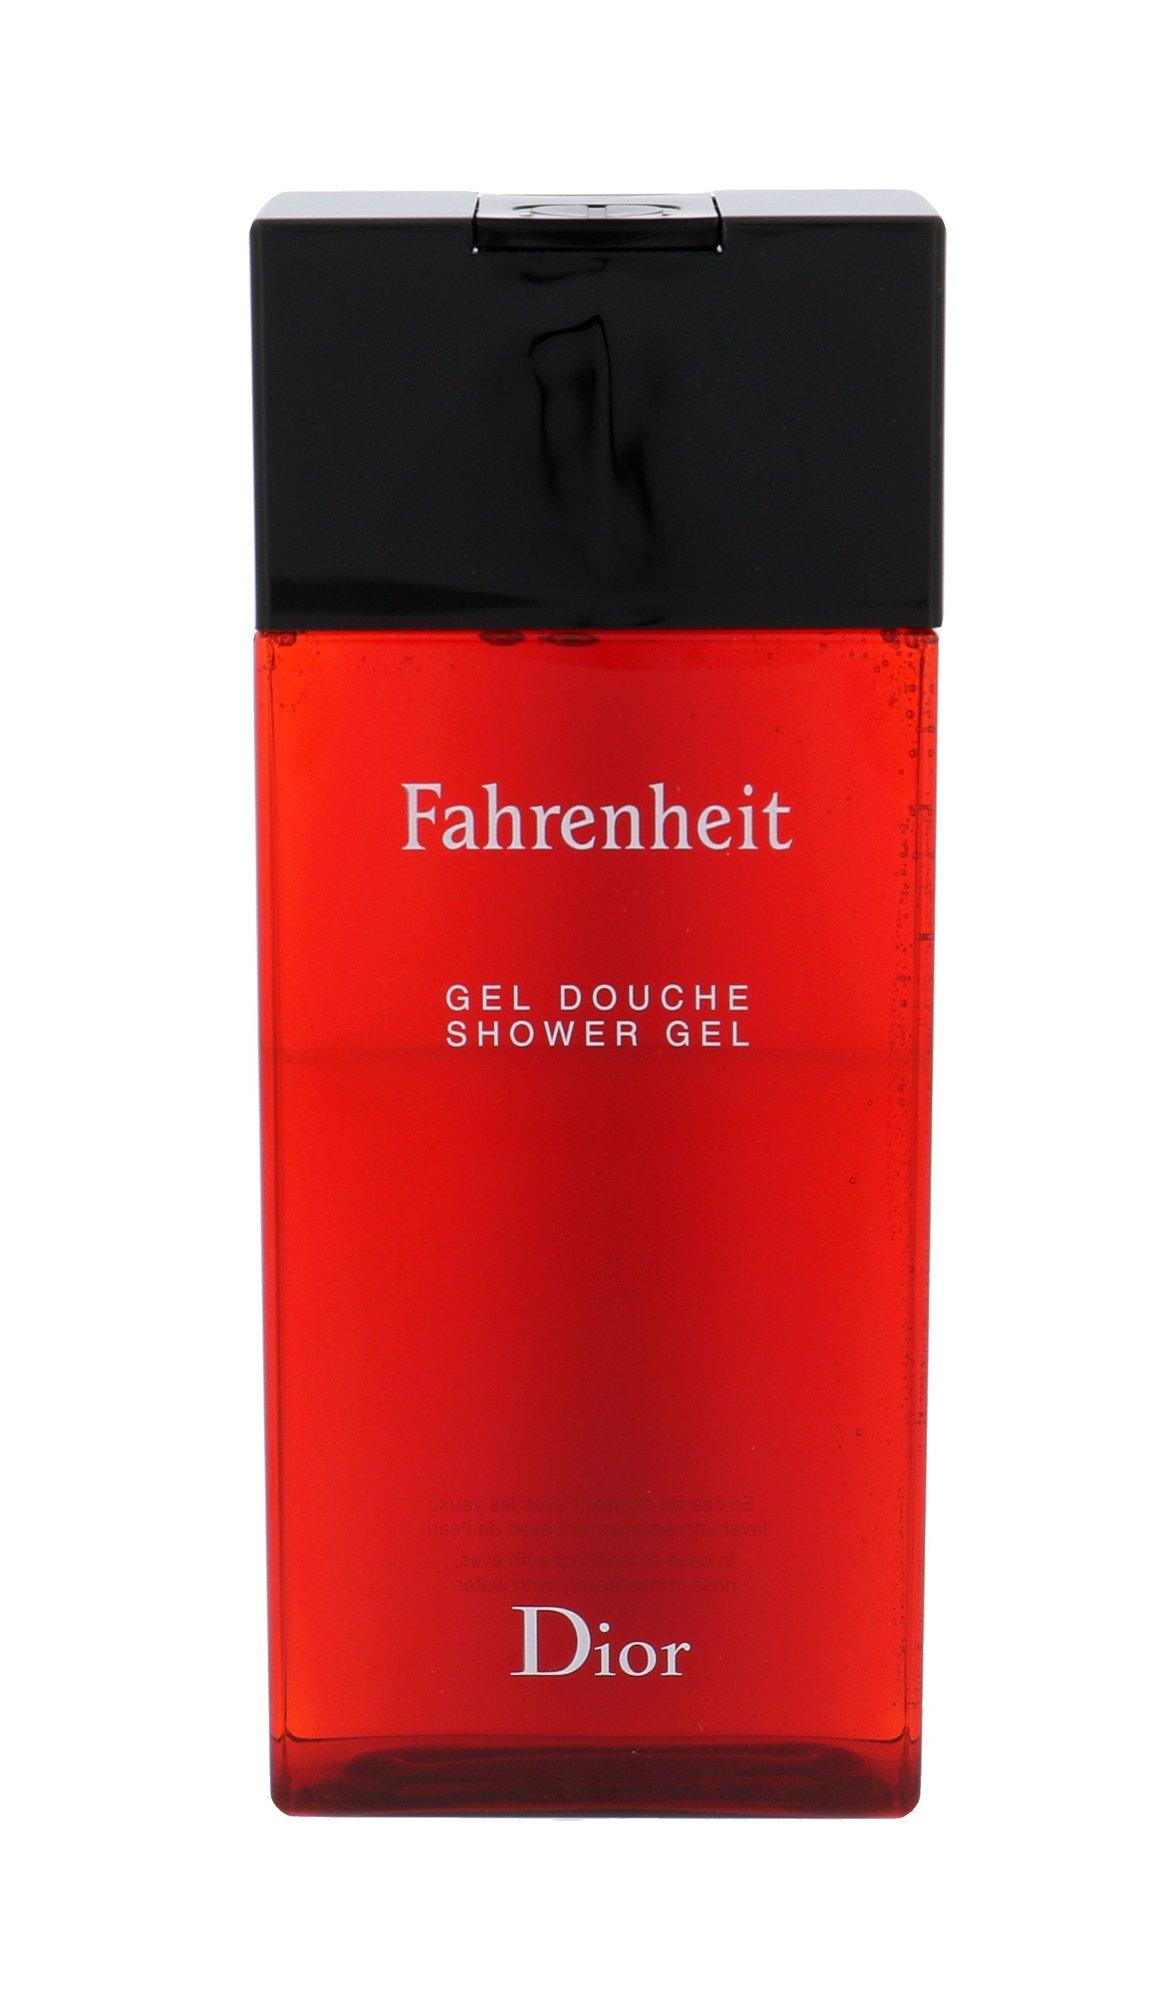 Christian Dior Fahrenheit Shower Gel 200ml